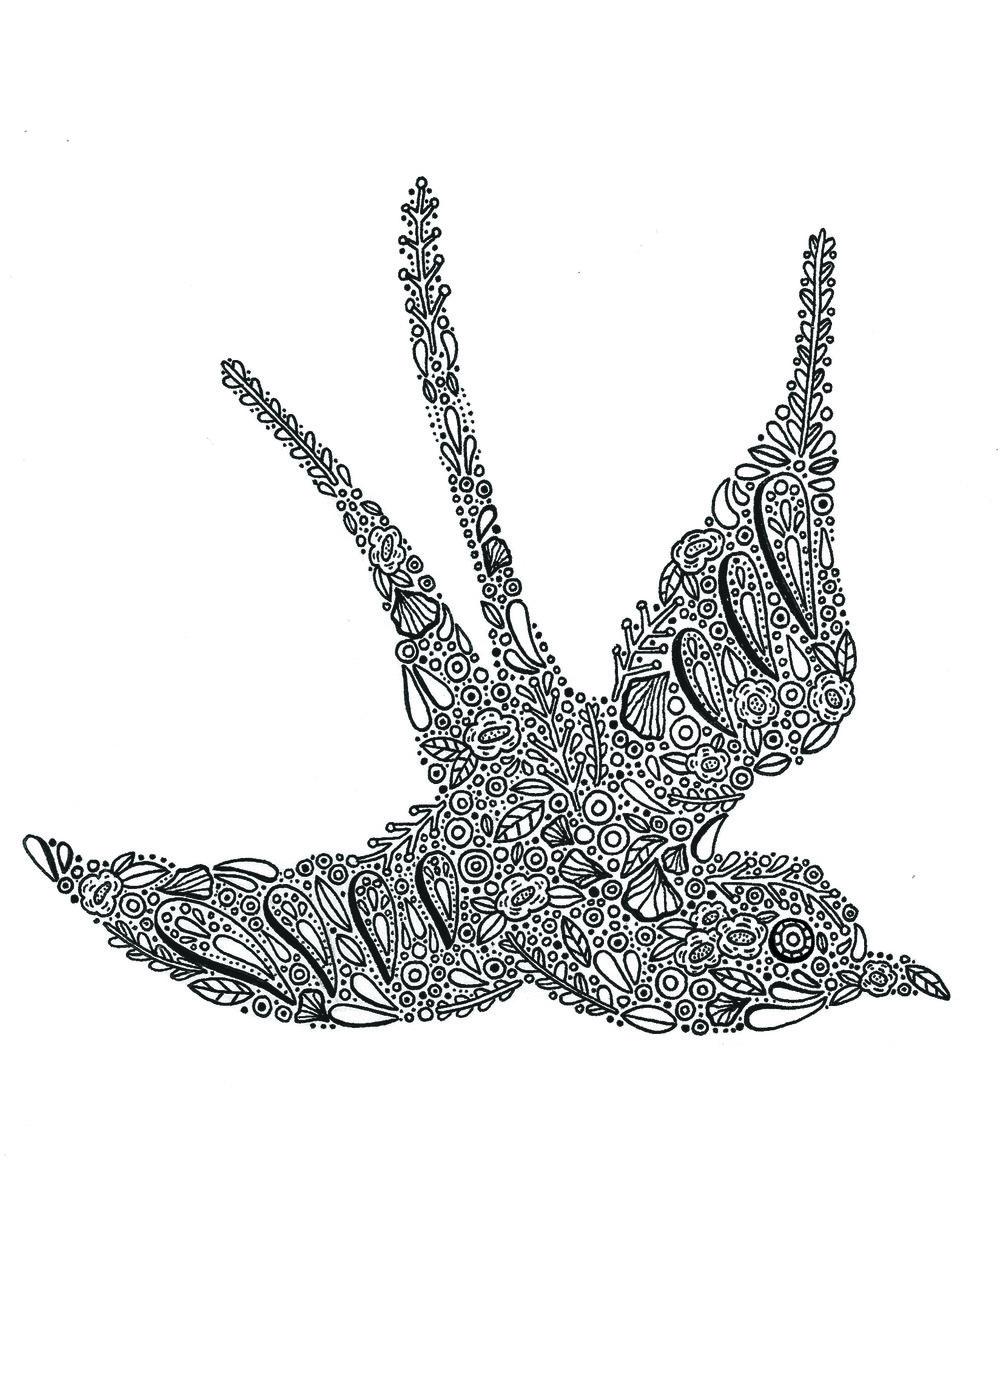 Treebird, bird